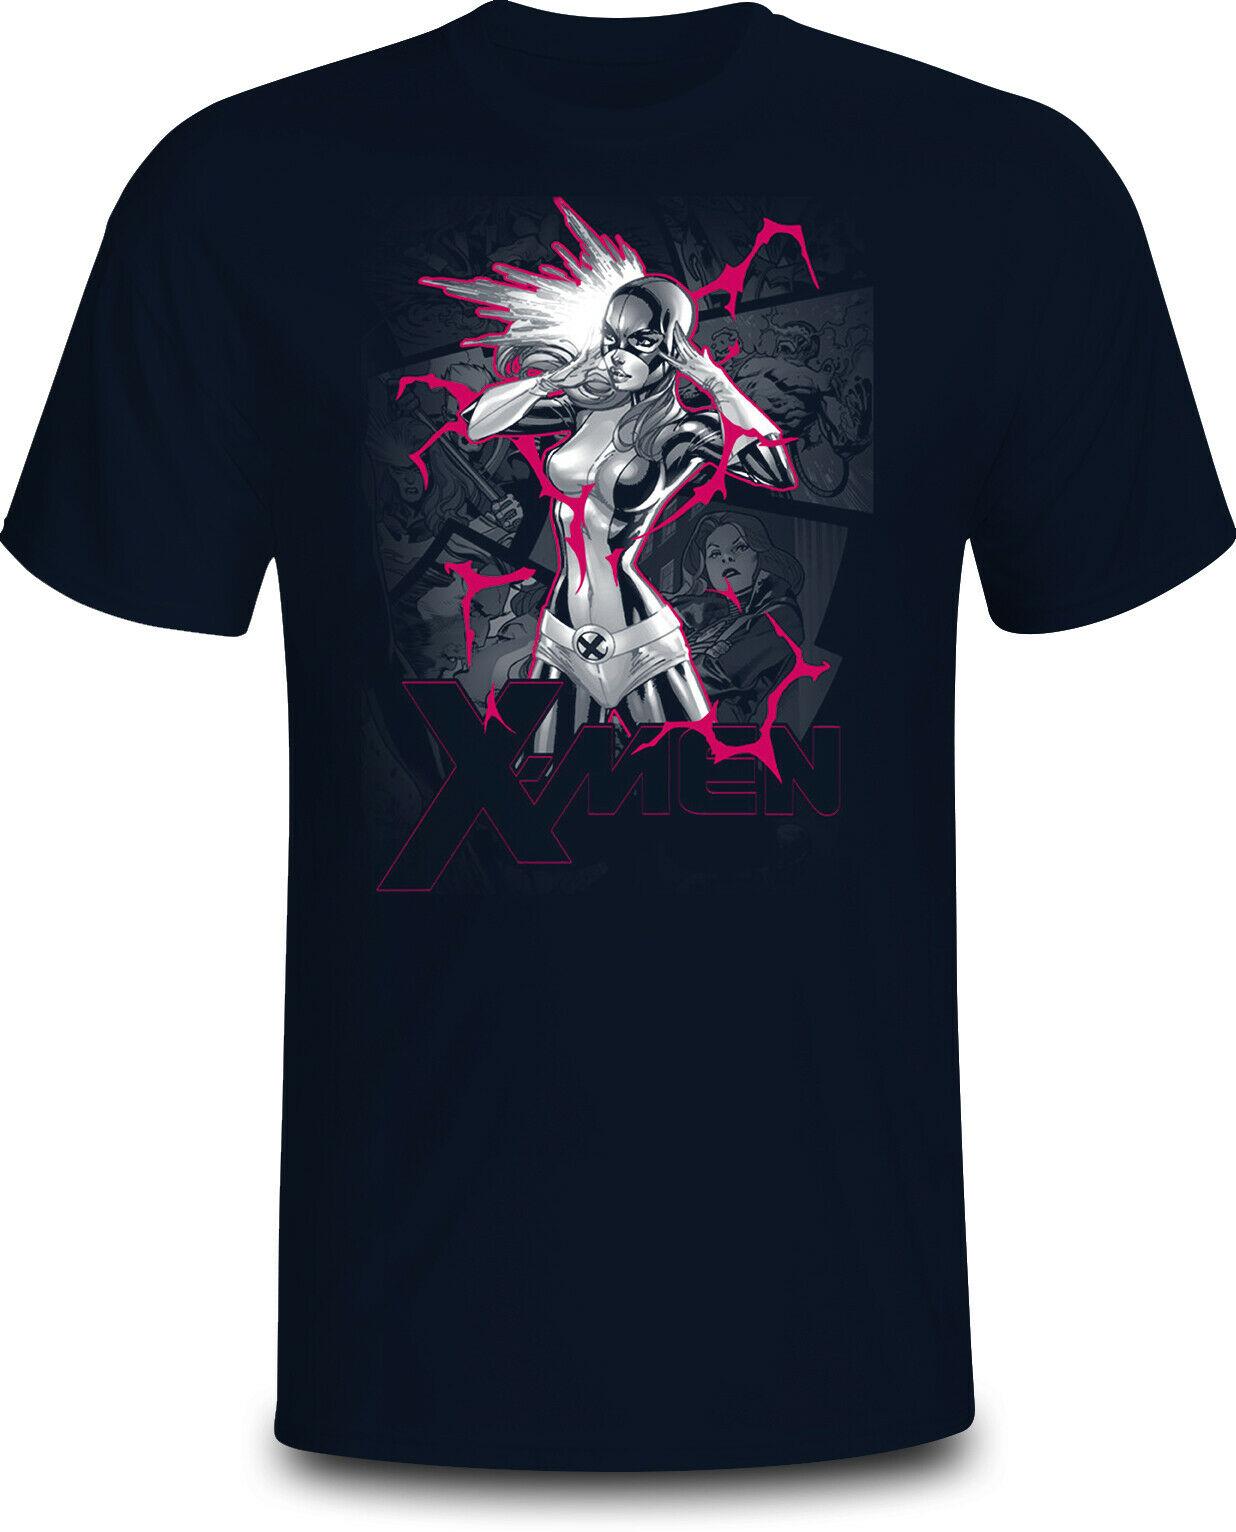 Camiseta nueva 2019 Jean gris Dark Phoenix Xmen negro Navy hombres-mujeres S-5XL.